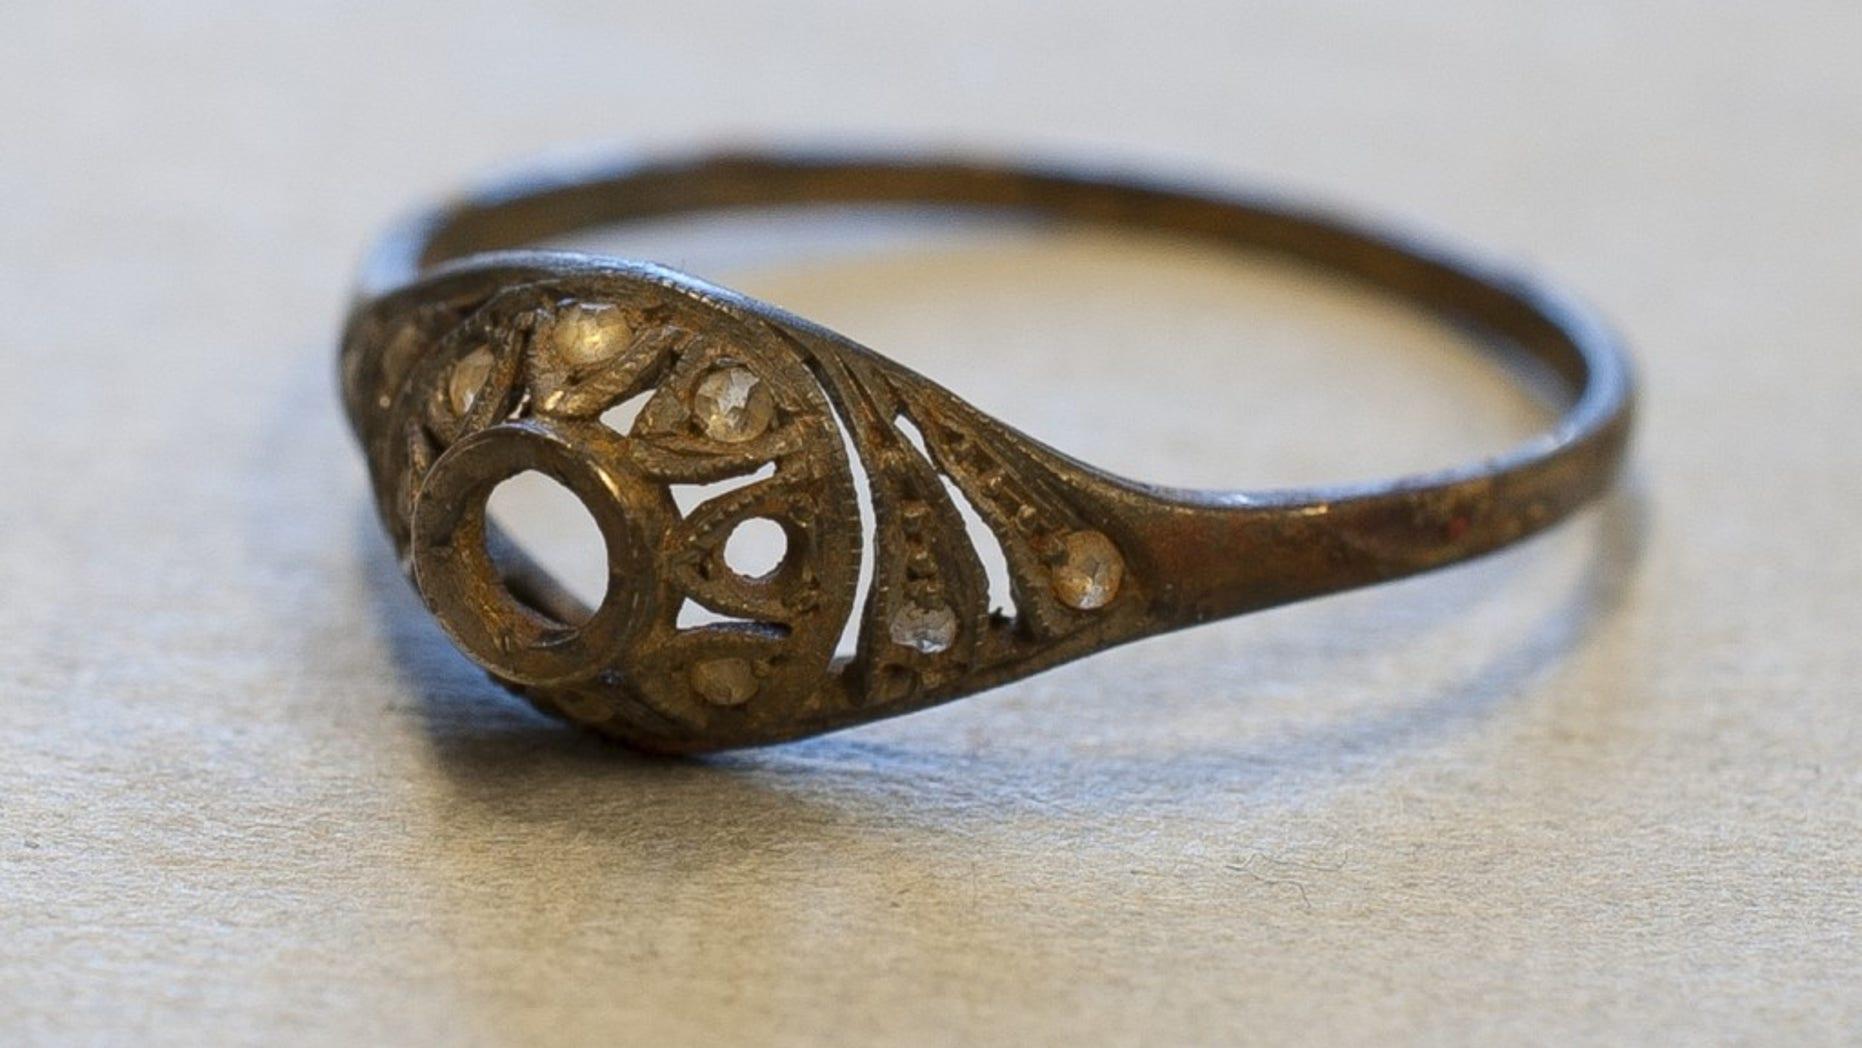 The gold ring. (Marcin Inglot)